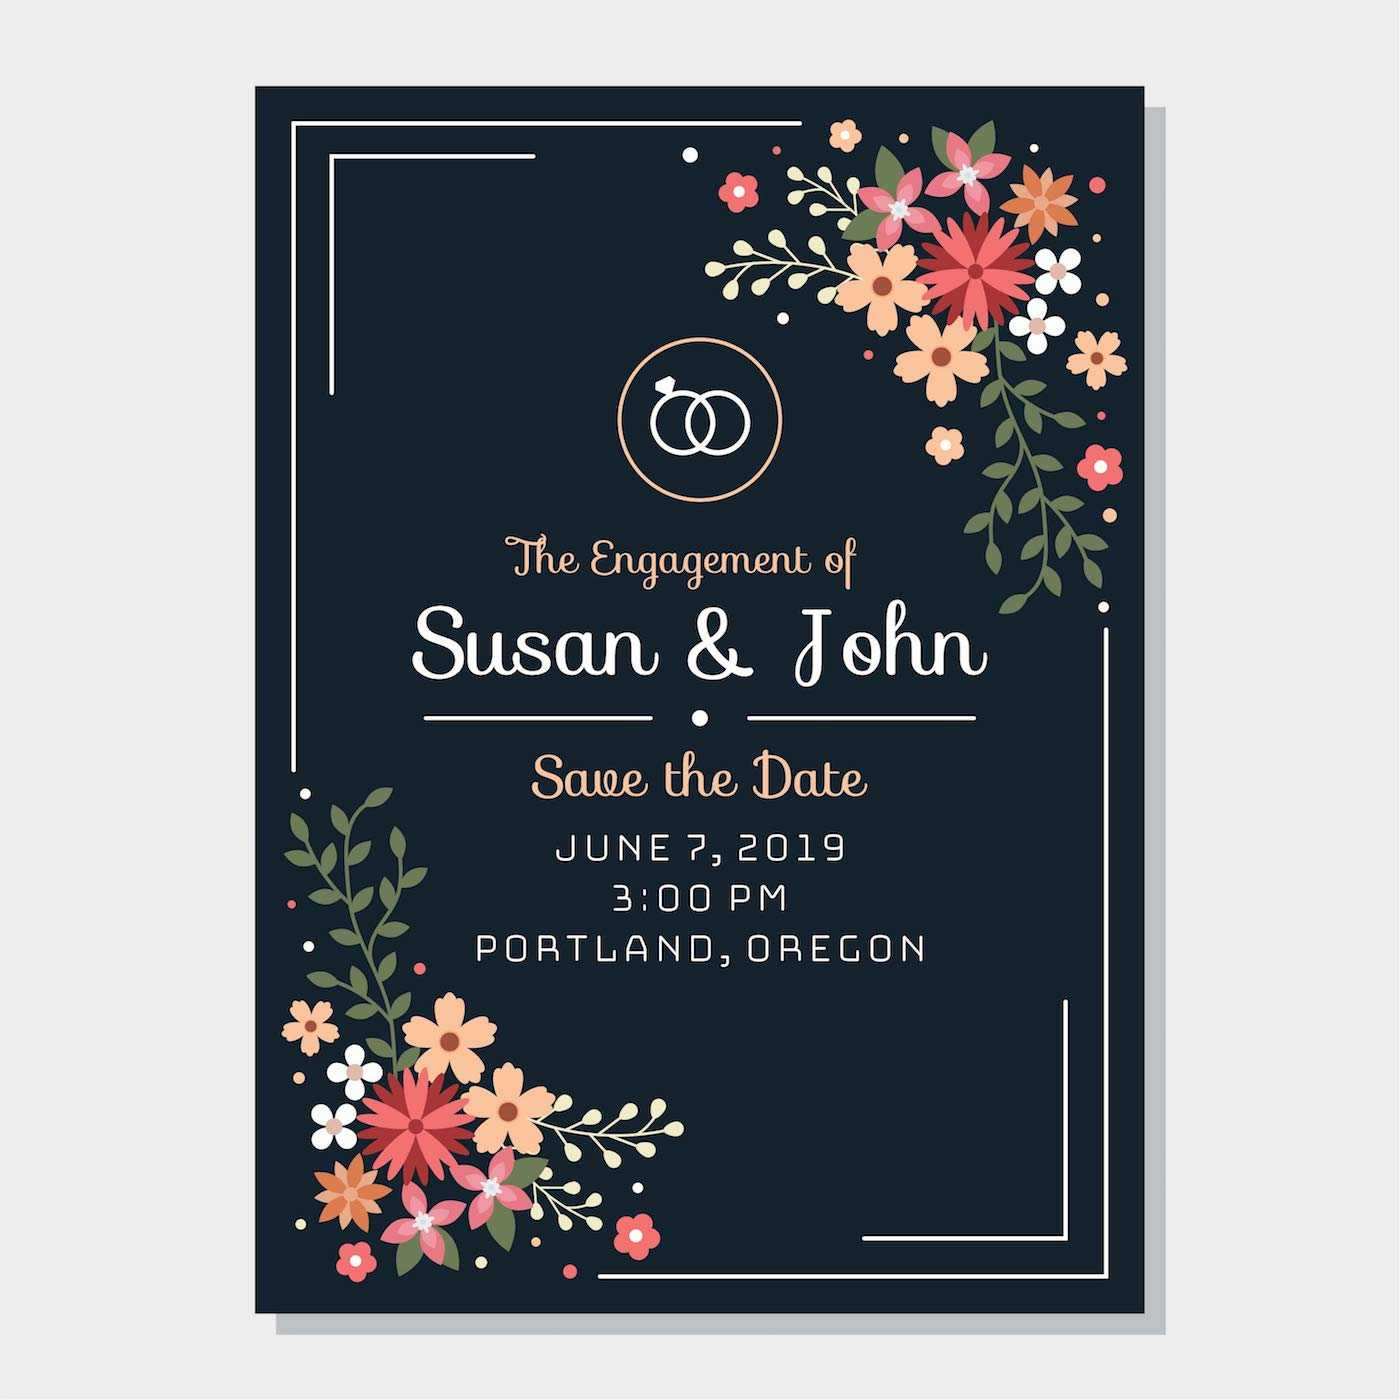 Engagement Invitation Free Vector Art - (888 Free Downloads) Intended For Engagement Invitation Card Template